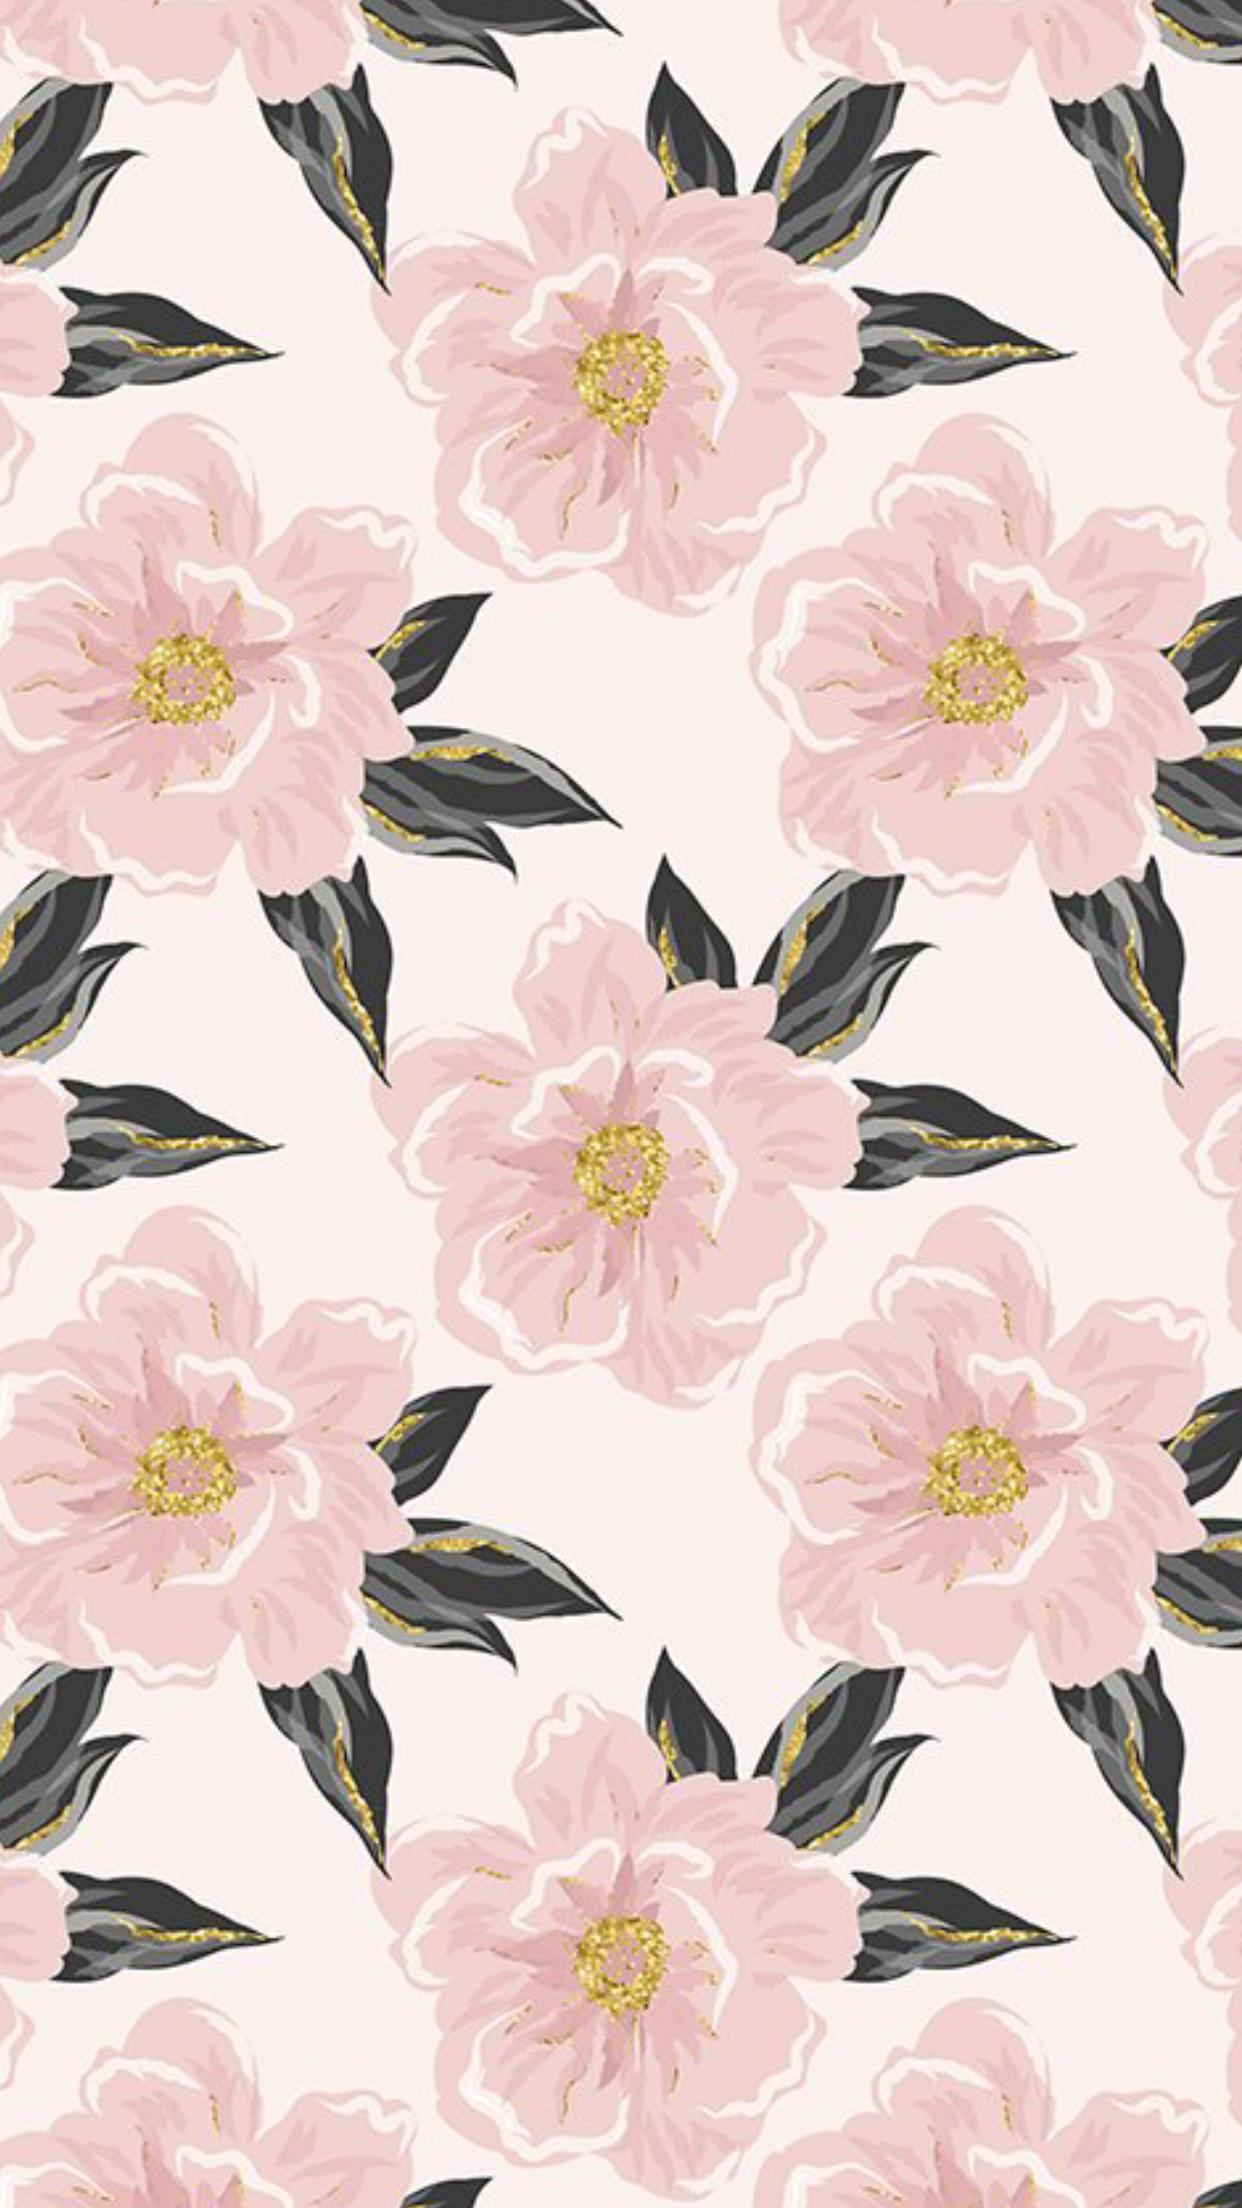 Flowers Pattern Pink Pastel In 2019 Flower Background